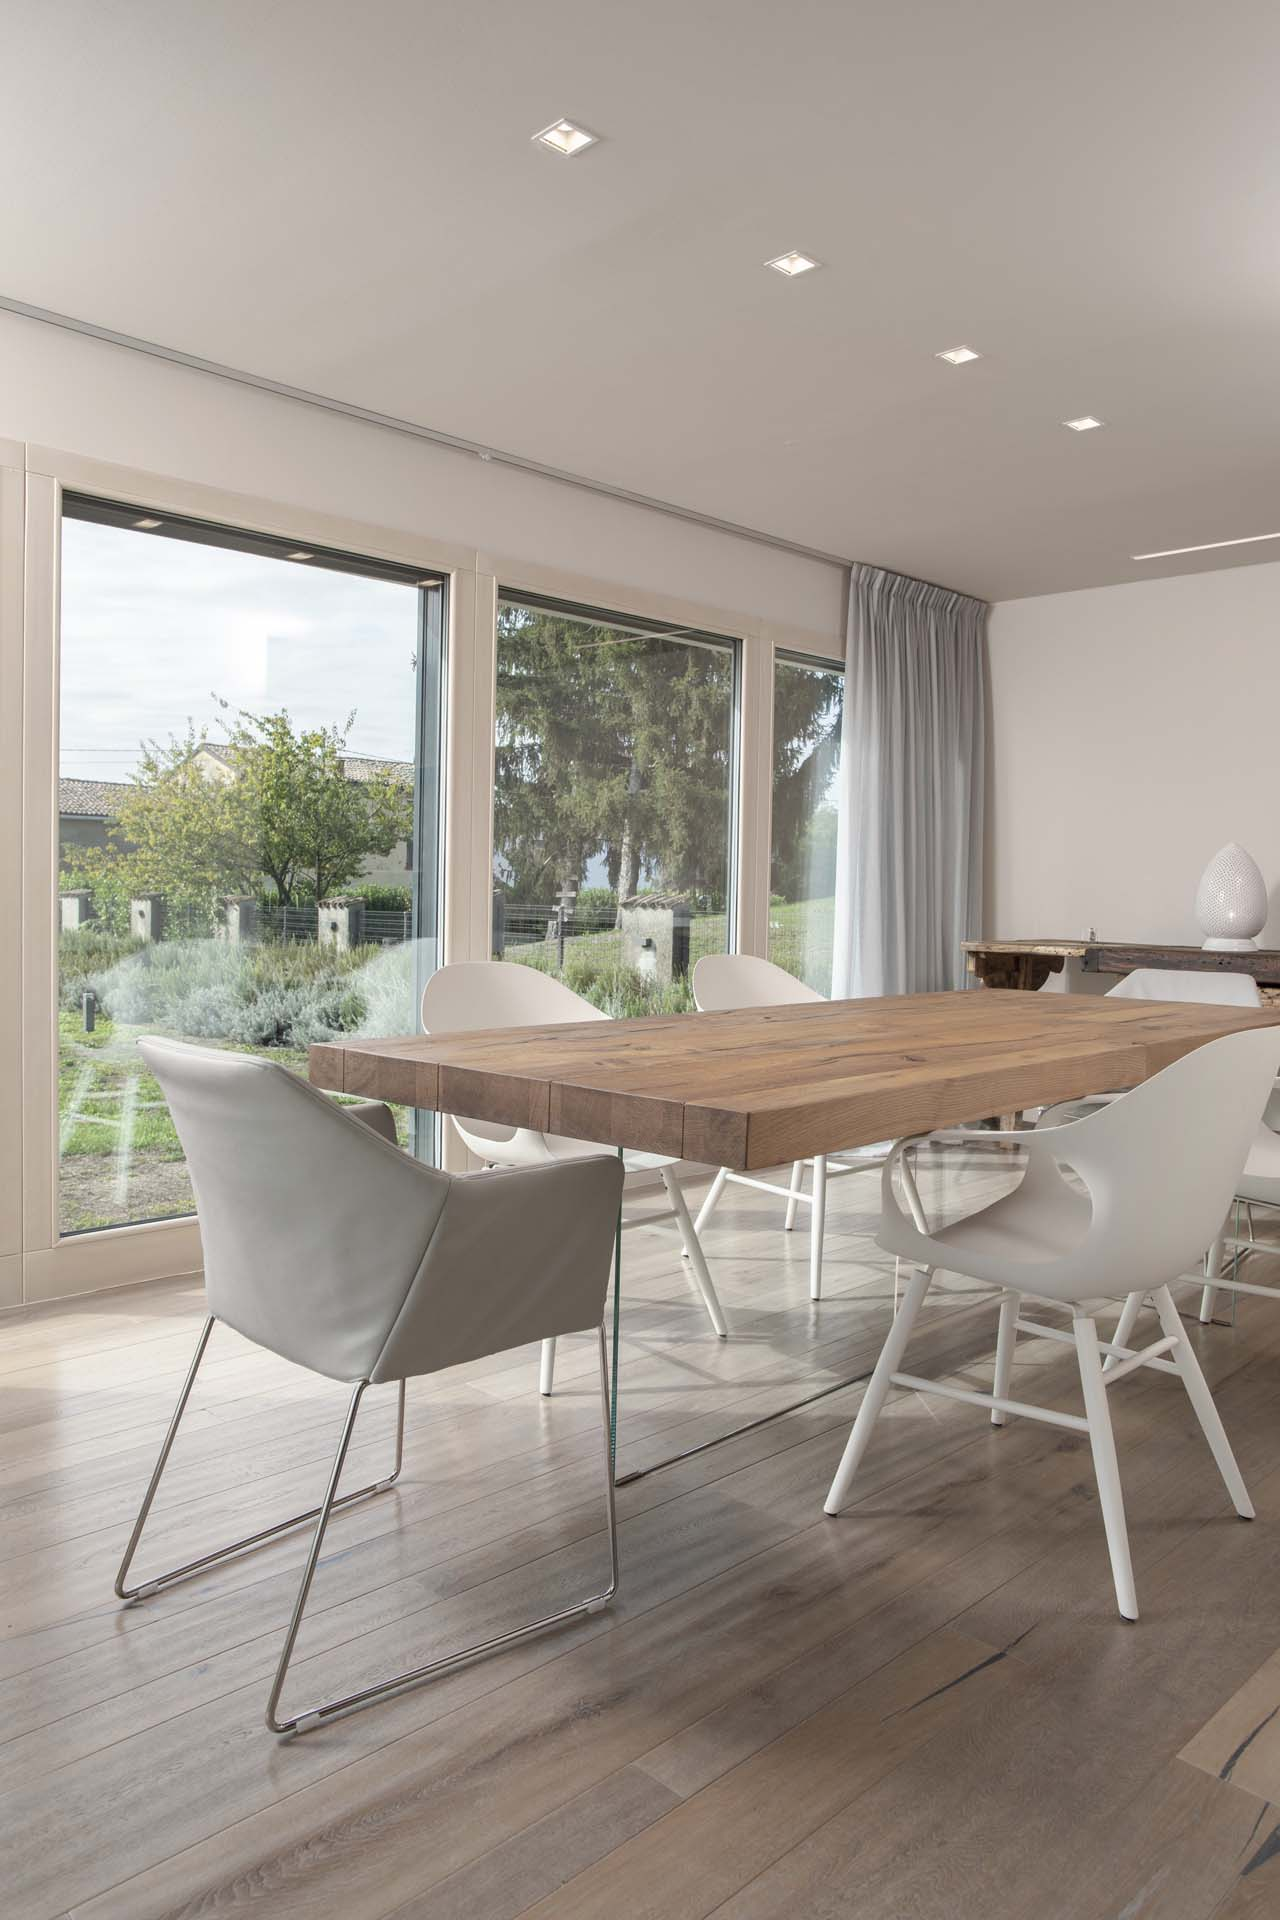 <b>foto interna, sala pranzo e cucina - travature in legno lamellare sbiancato</b>